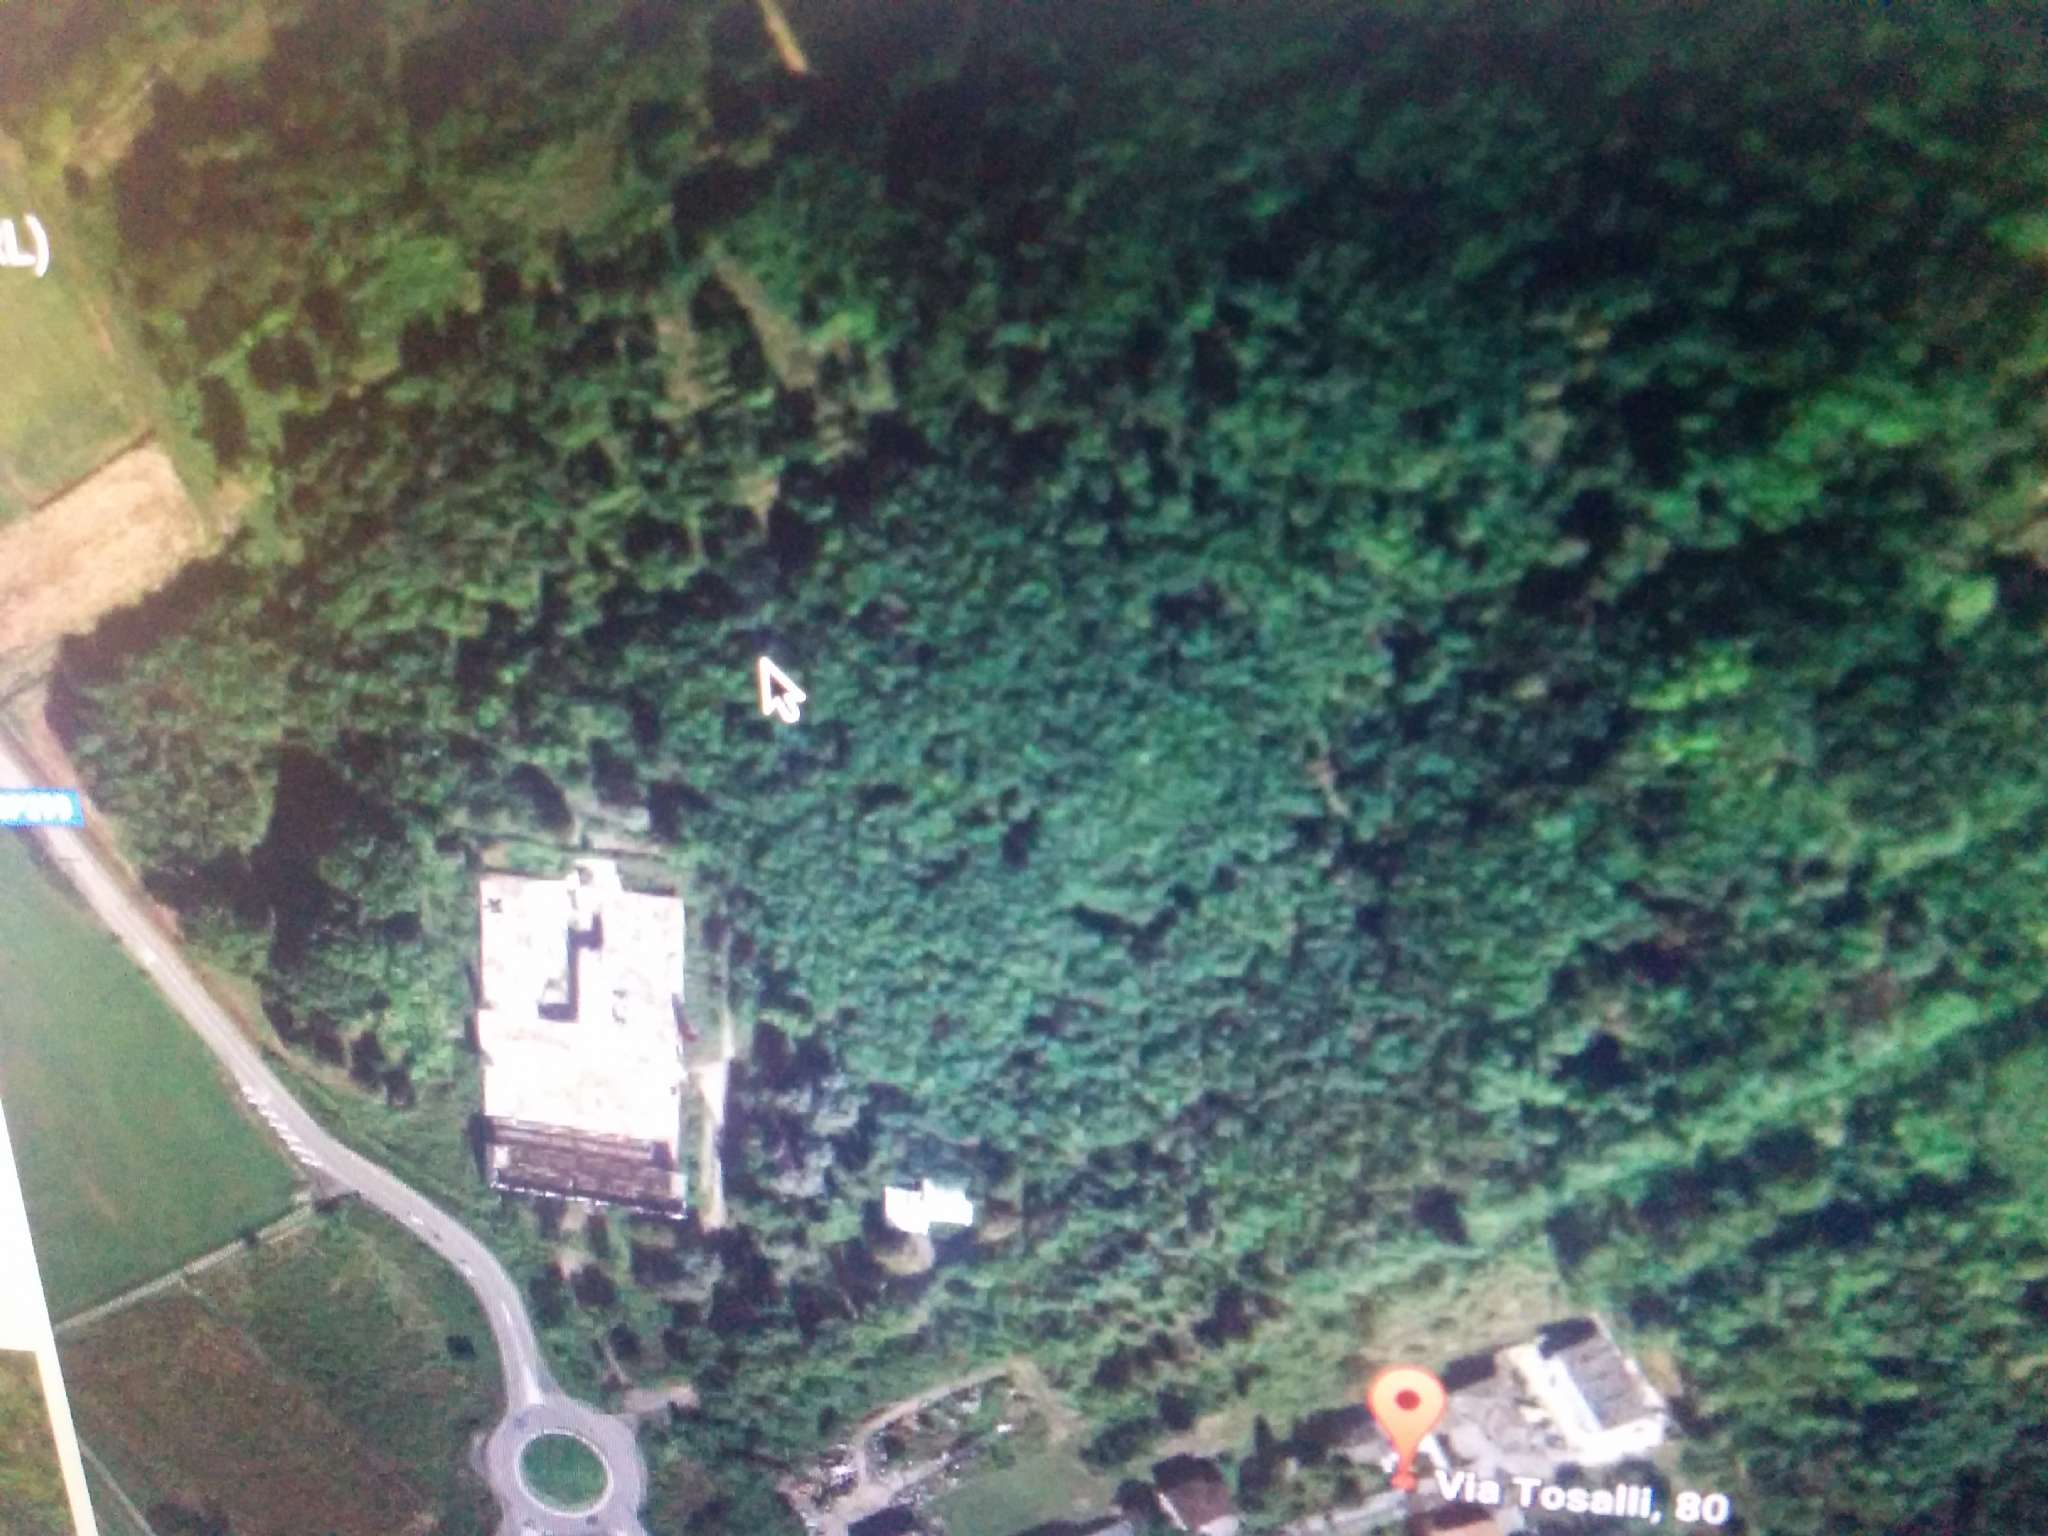 Terreno industriale Rif.11567951